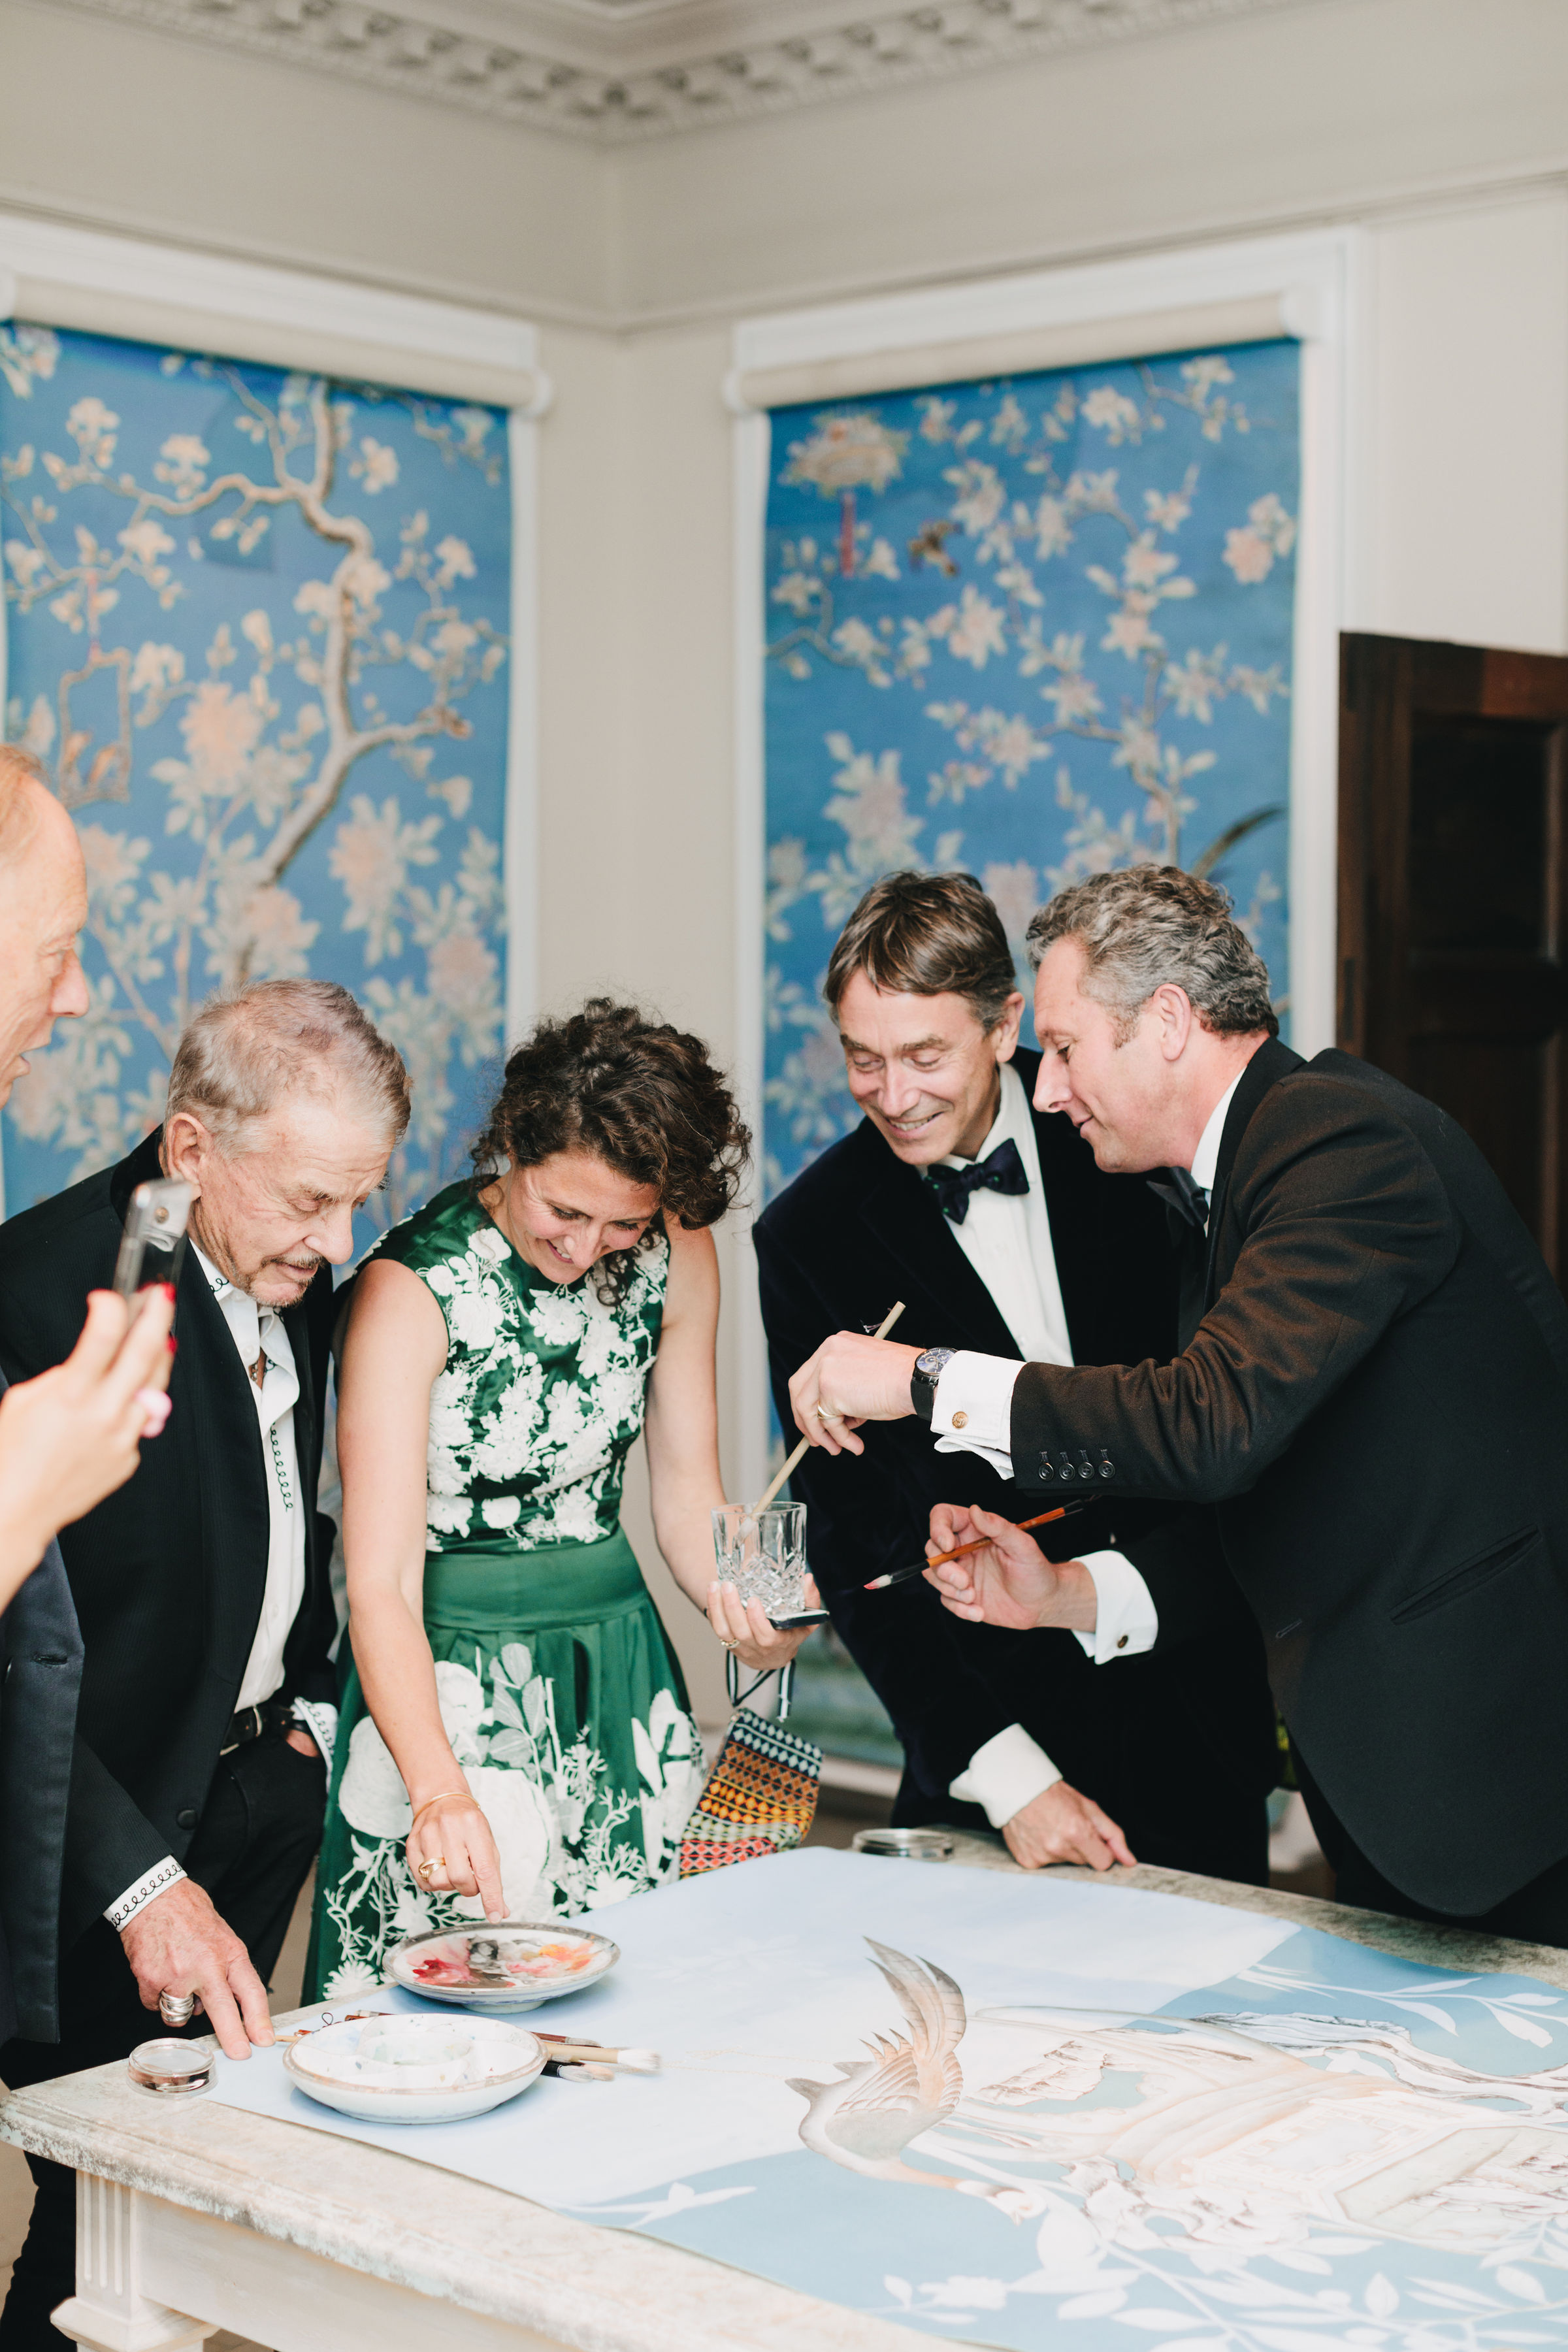 Nicholas Haslam, Lucy Hammond Giles (Colefax & Fowler), Lord David Cholmondeley & Dominic Evans-Freke (de Gournay) I.jpg